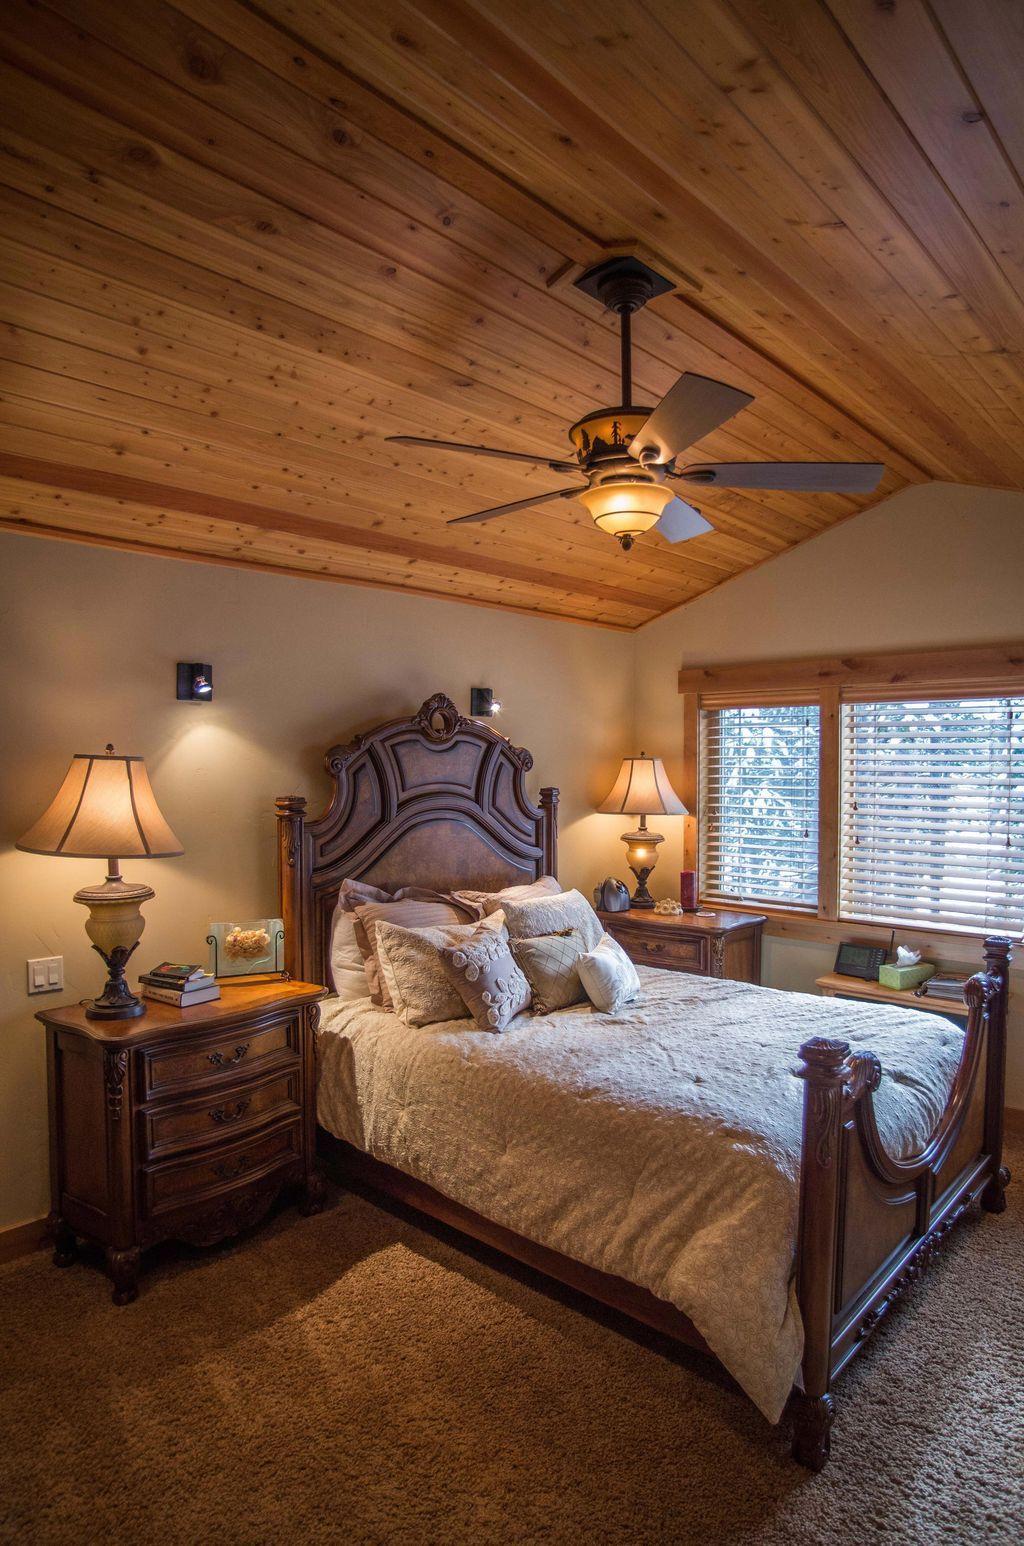 42 romantic rustic farmhouse bedroom design and